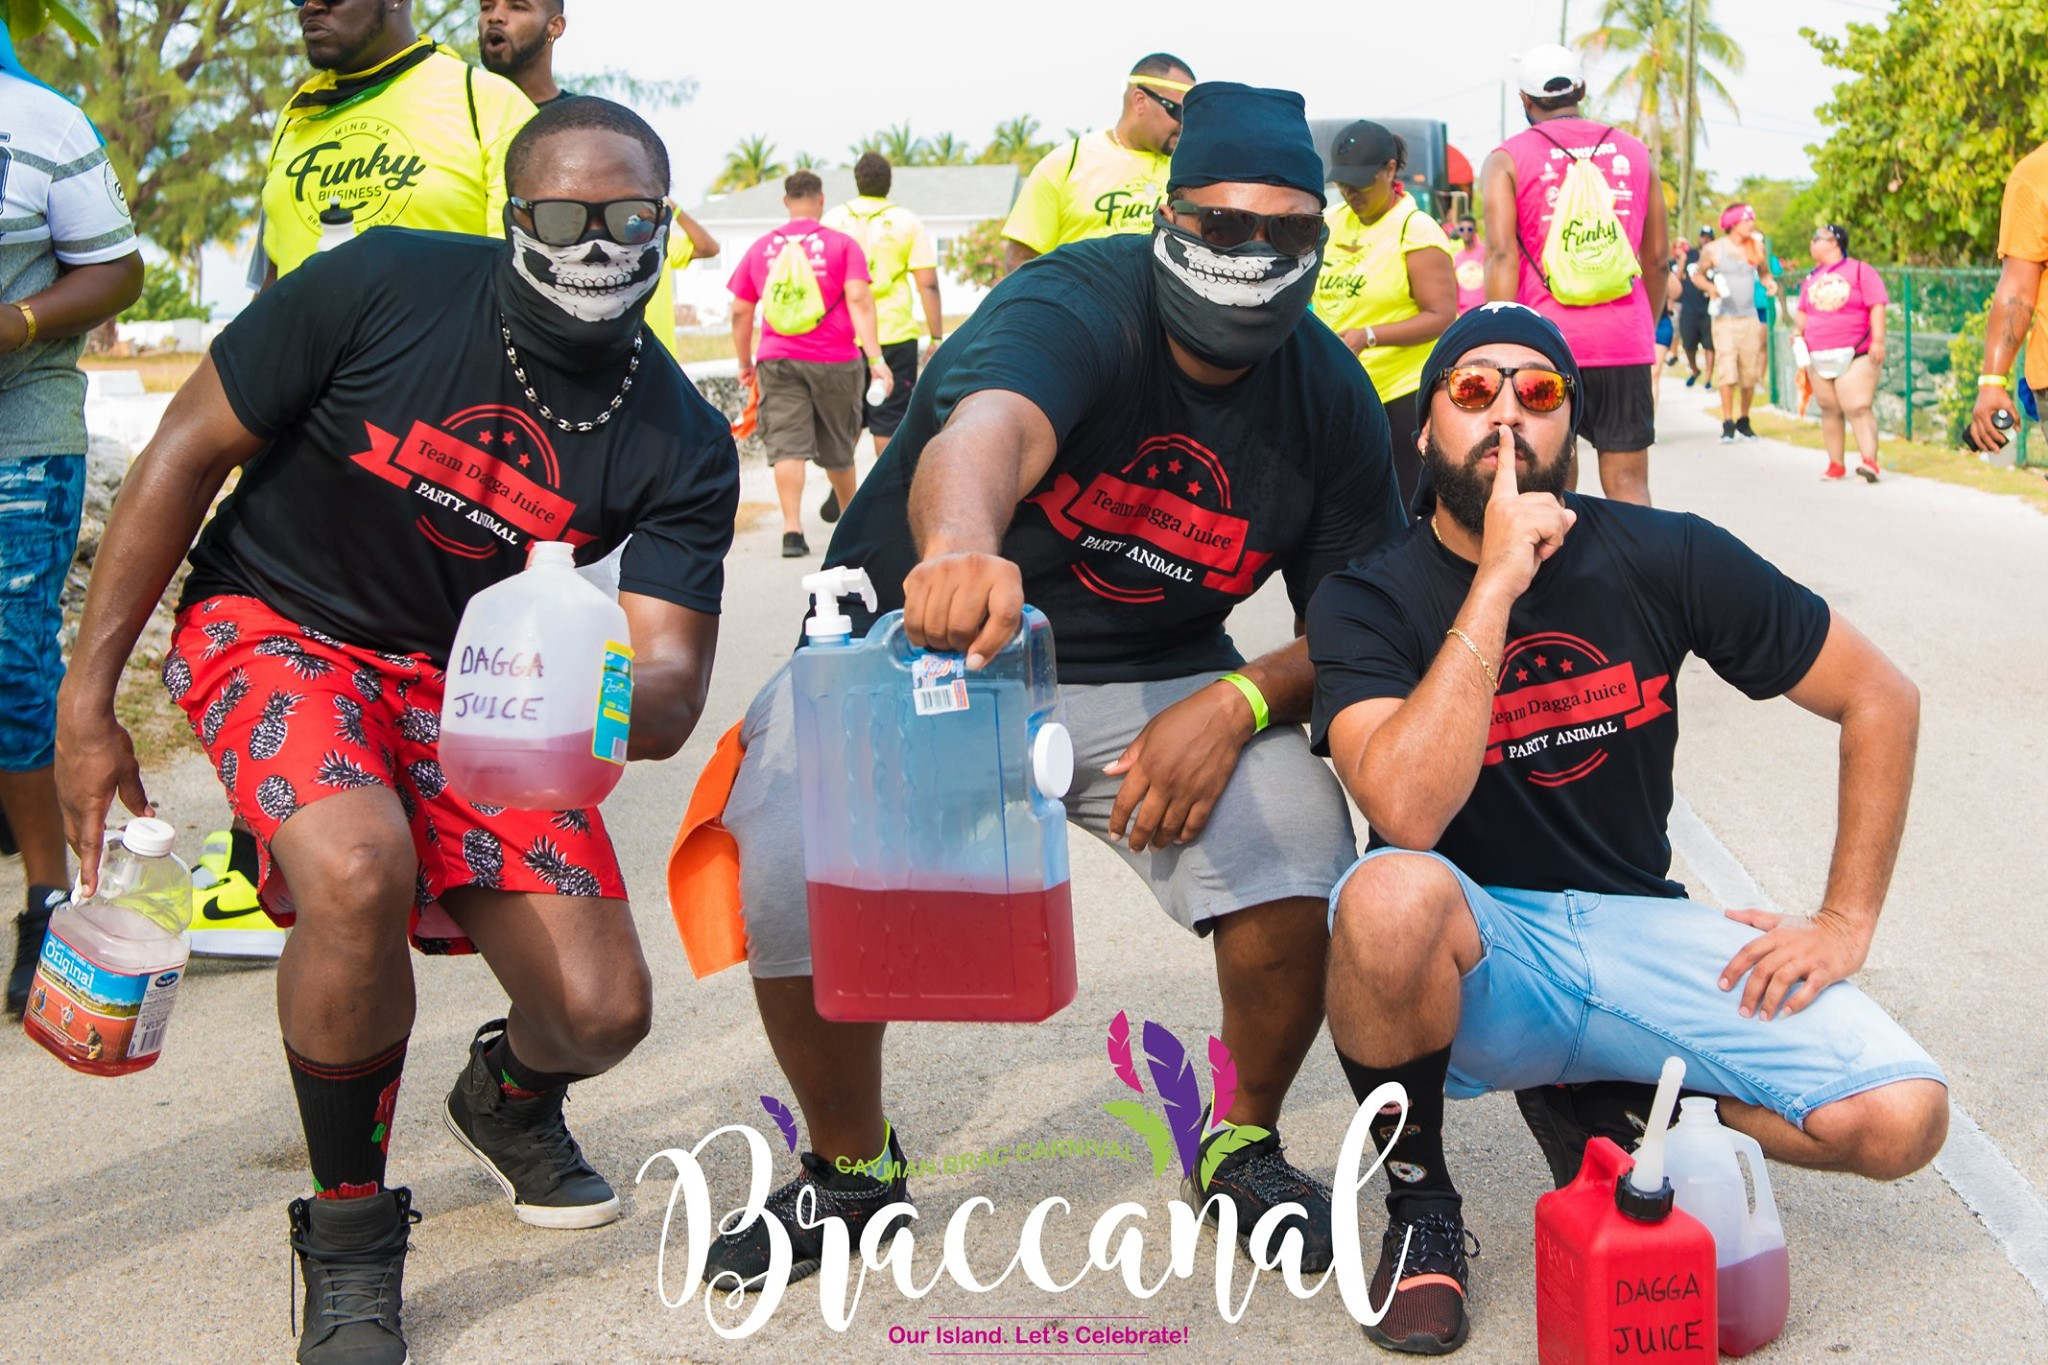 Braccanal 2019